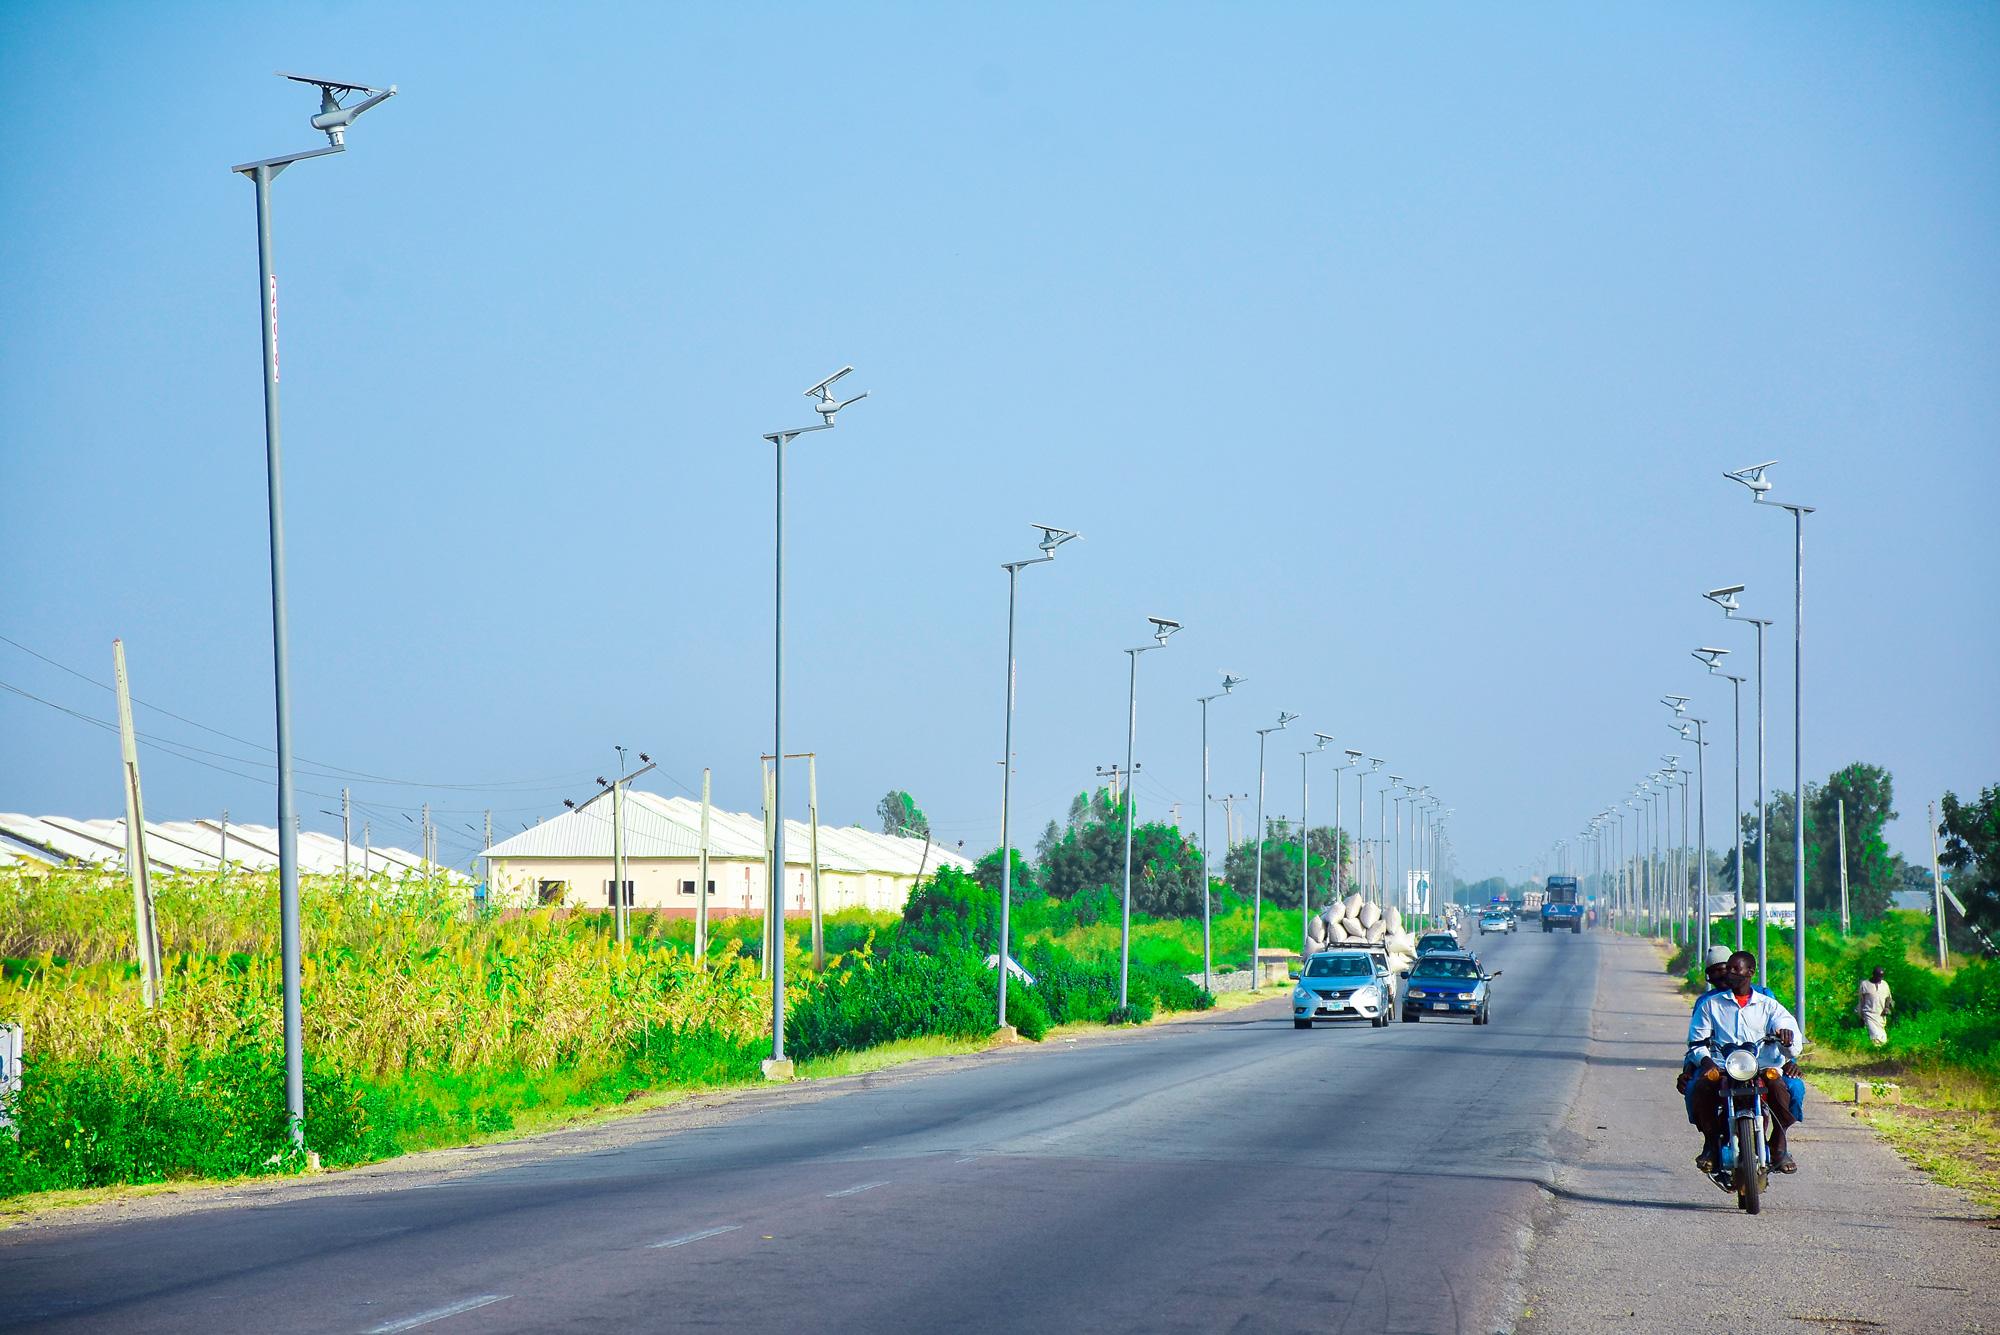 Solar street lights in Gusau Nigeria